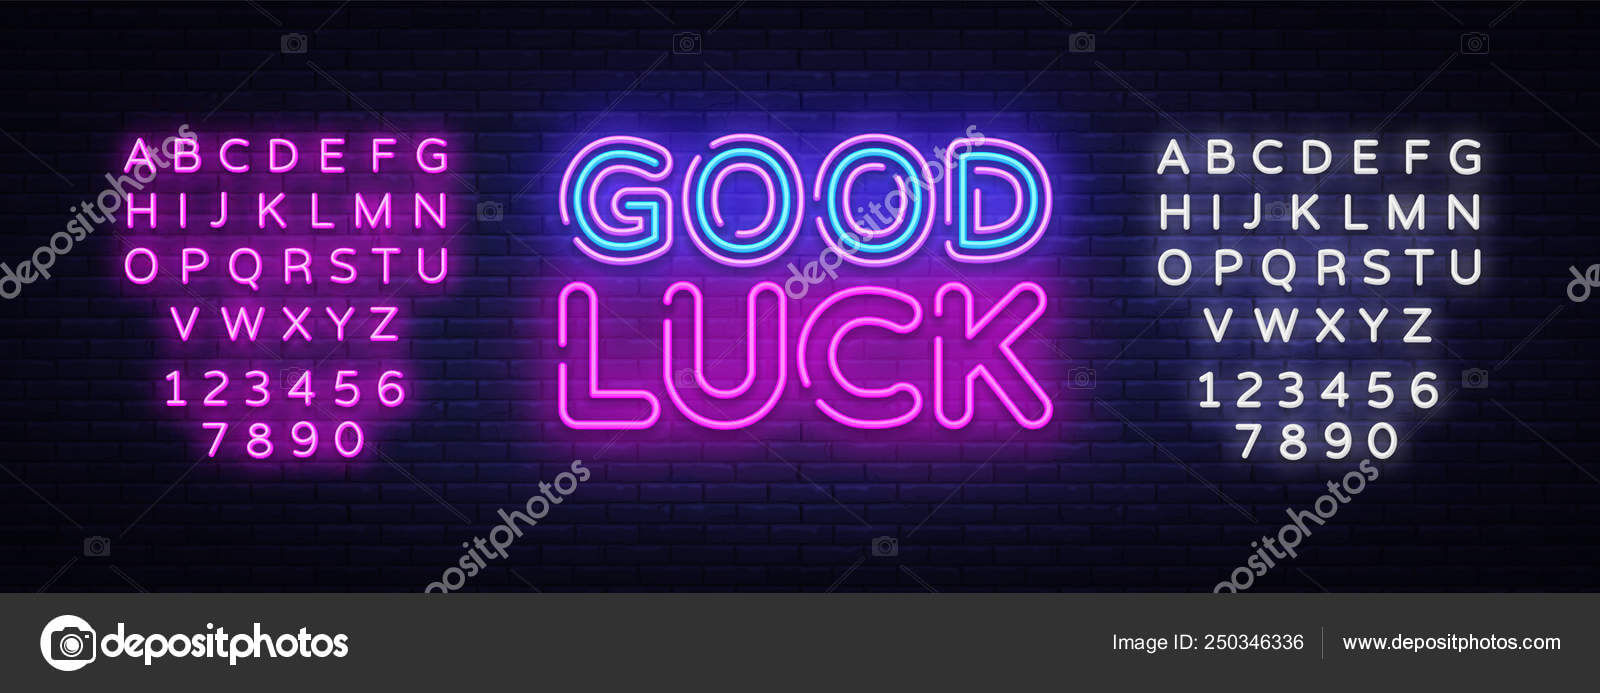 Good Luck Neon Sign Vector. Good Luck Design Template Neon Intended For Good Luck Banner Template